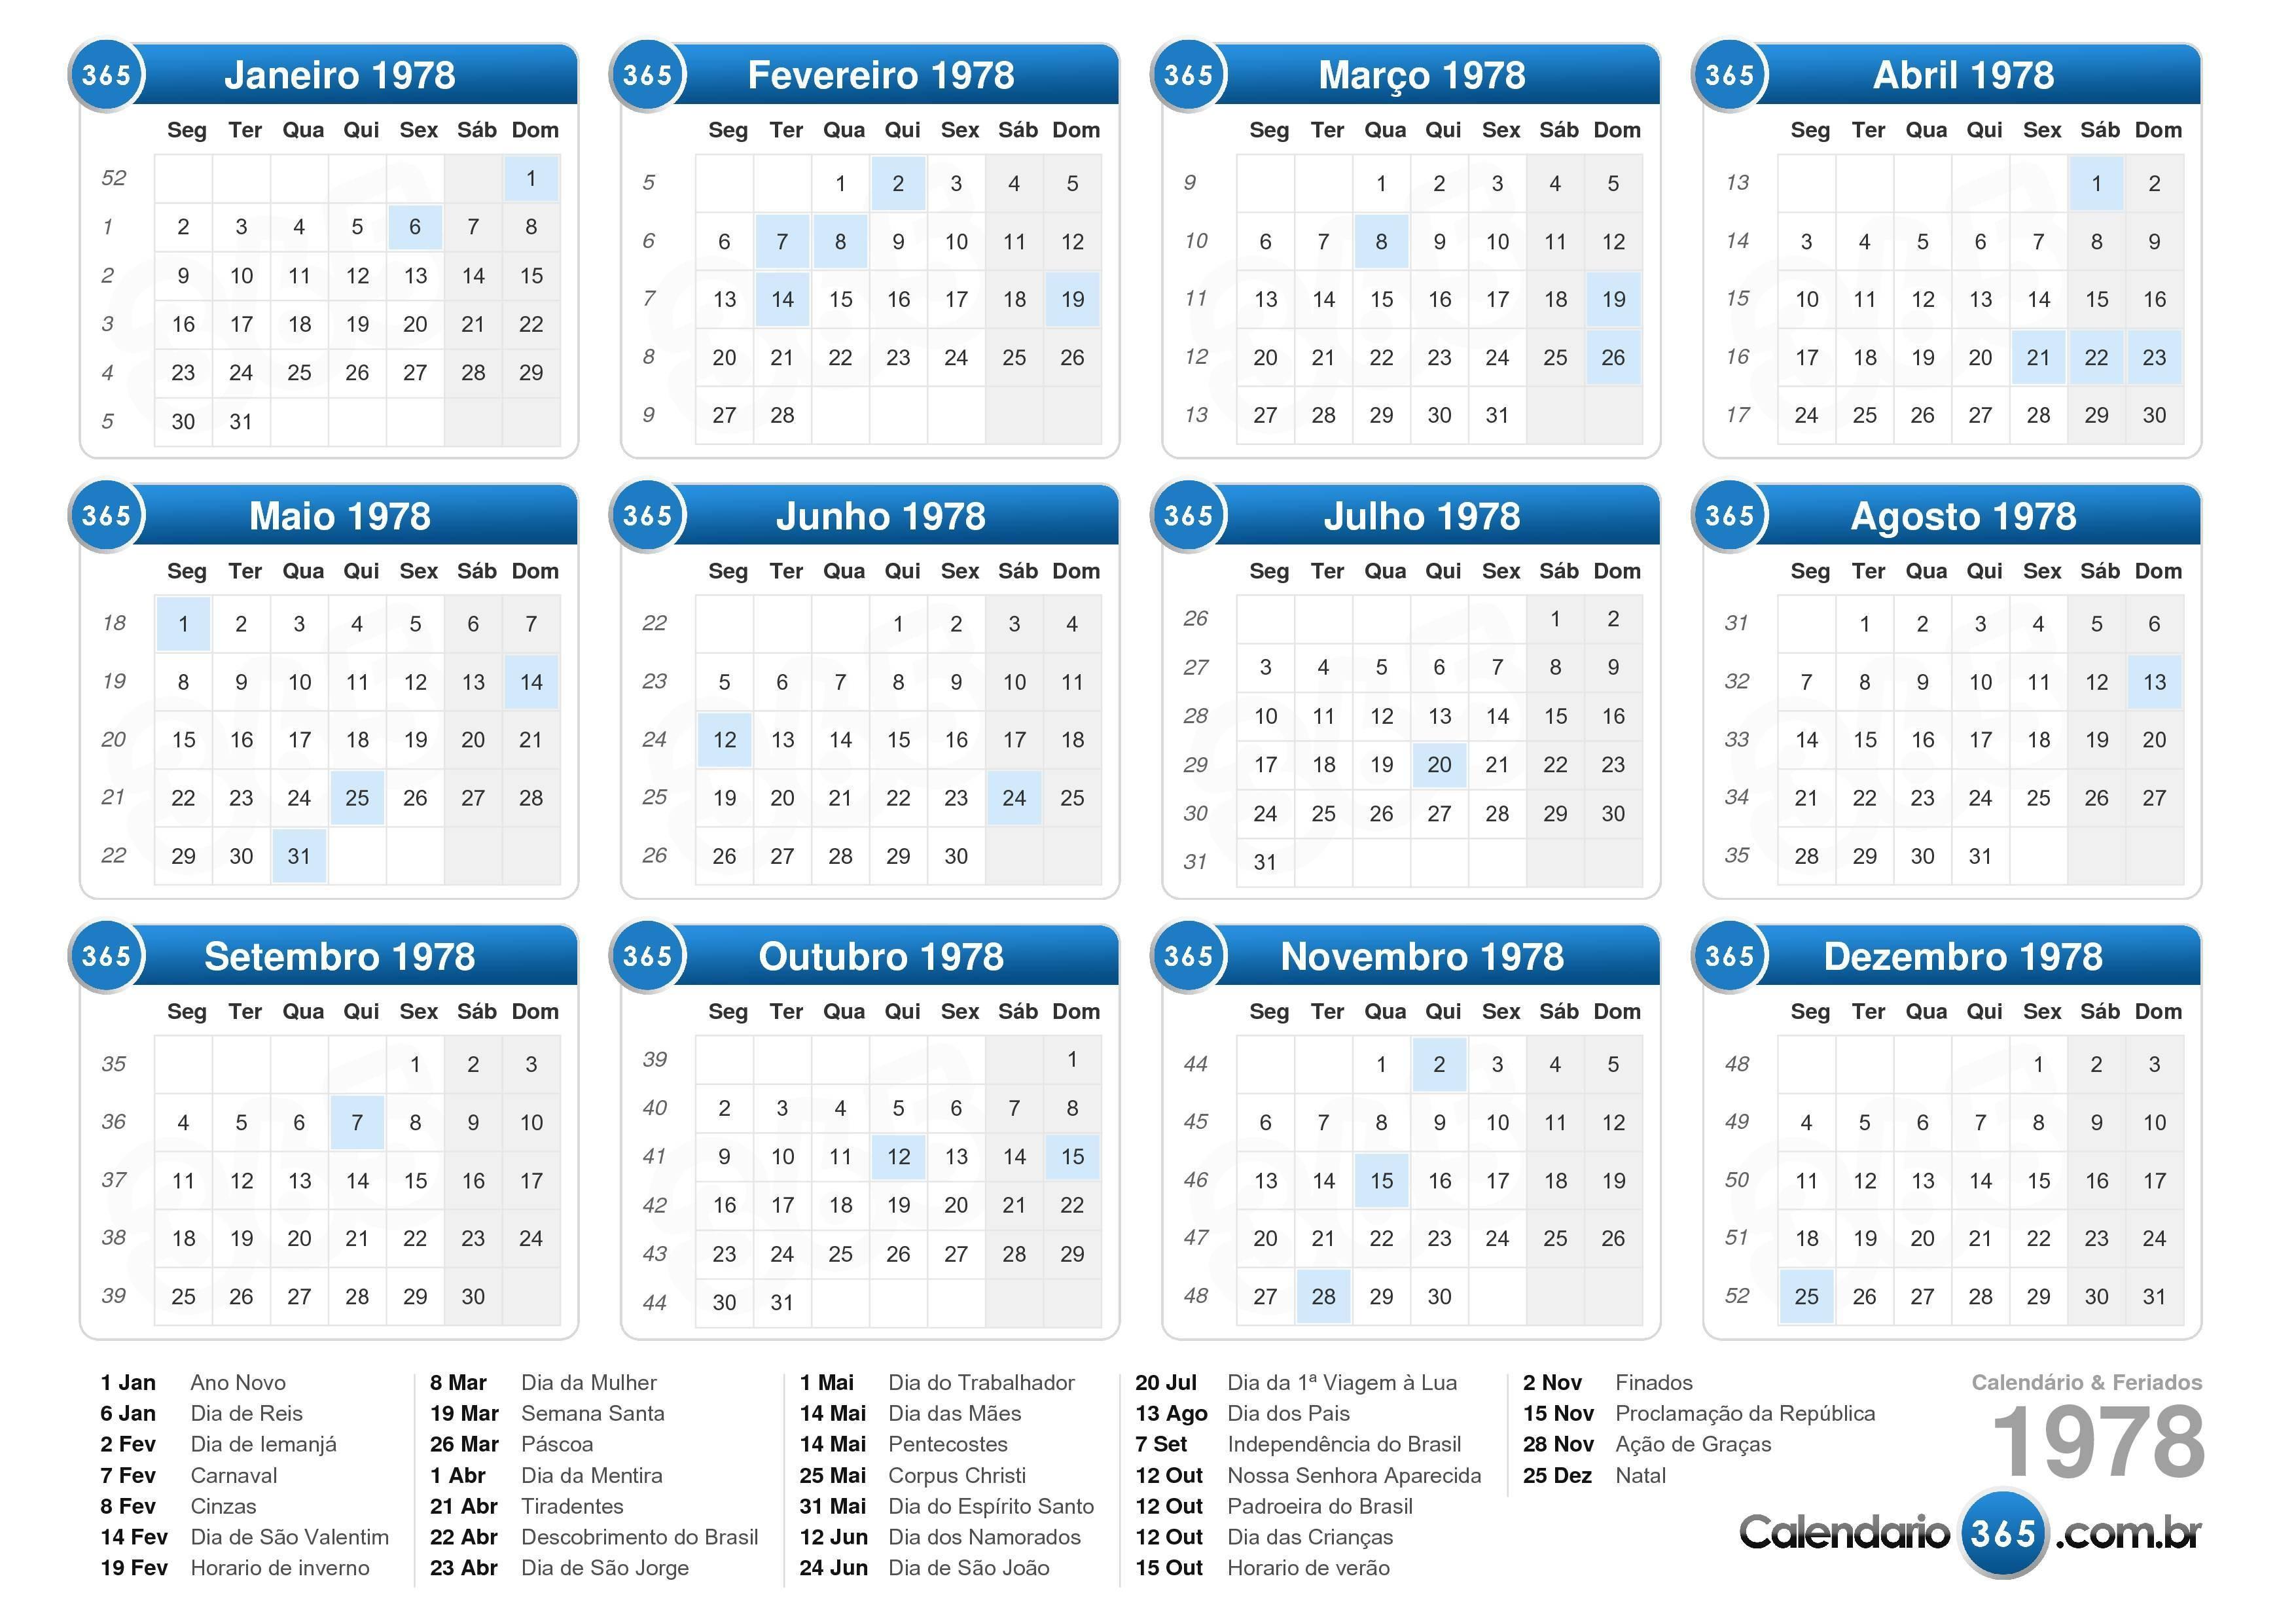 Calendario De Outubro 2018 a Janeiro De 2019 Para Impressao